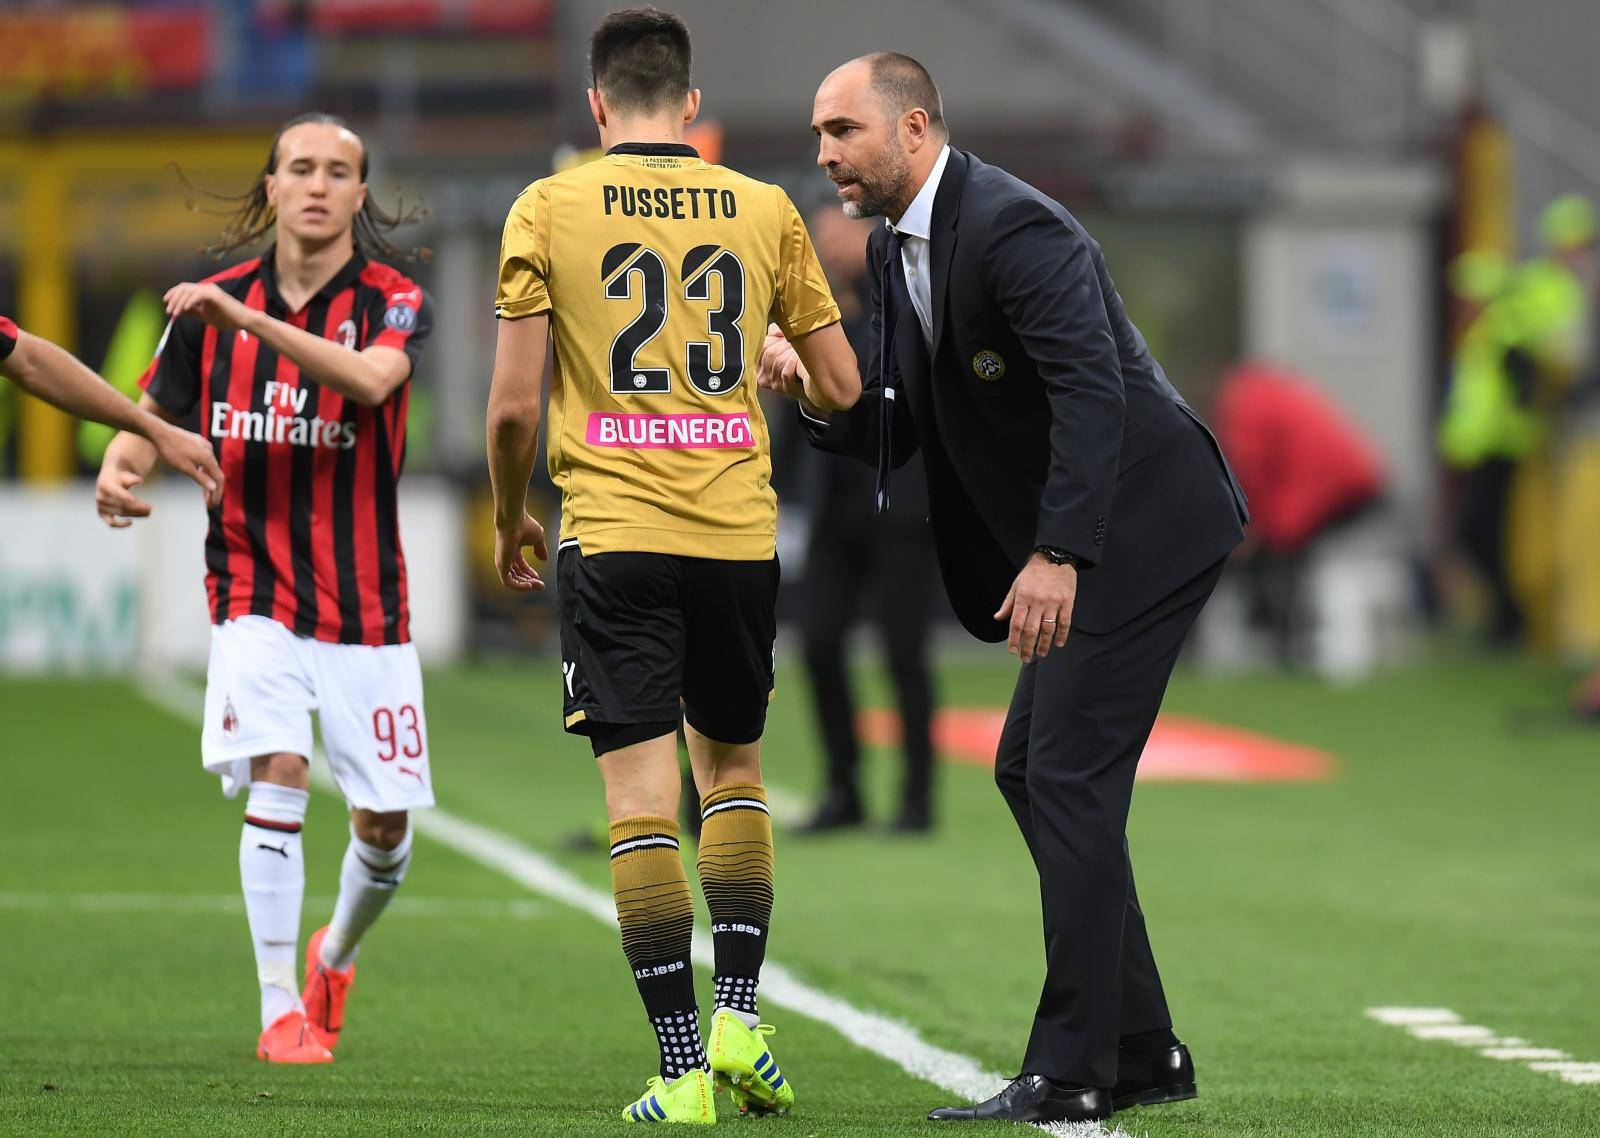 Serie A - AC Milan v Udinese